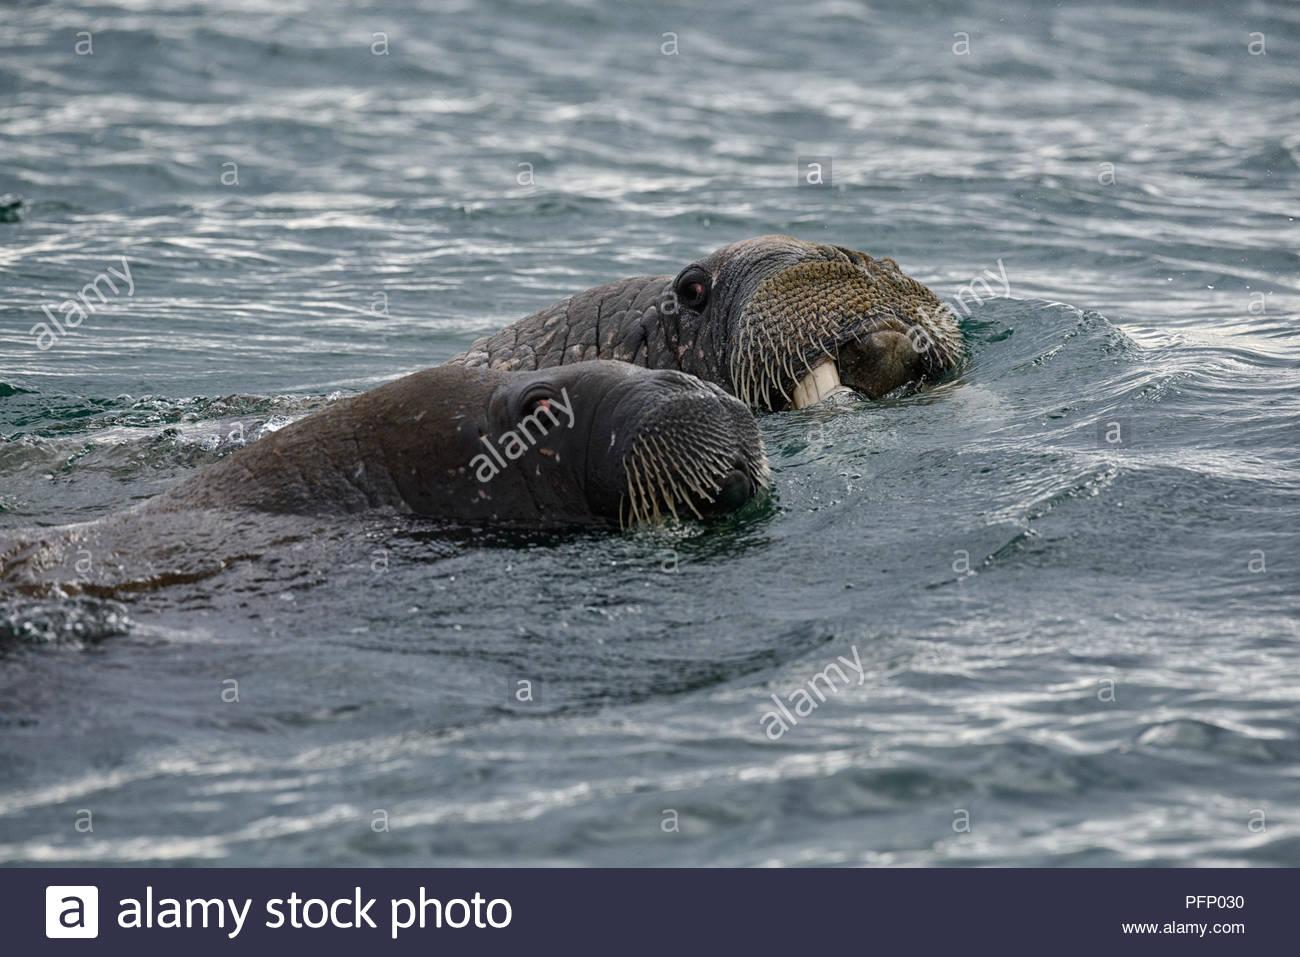 Walrus (Odobenus rosmarus),  in sea at Torellnesfjellet, Nordaustlandet, Svalbard, 2018 - Stock Image